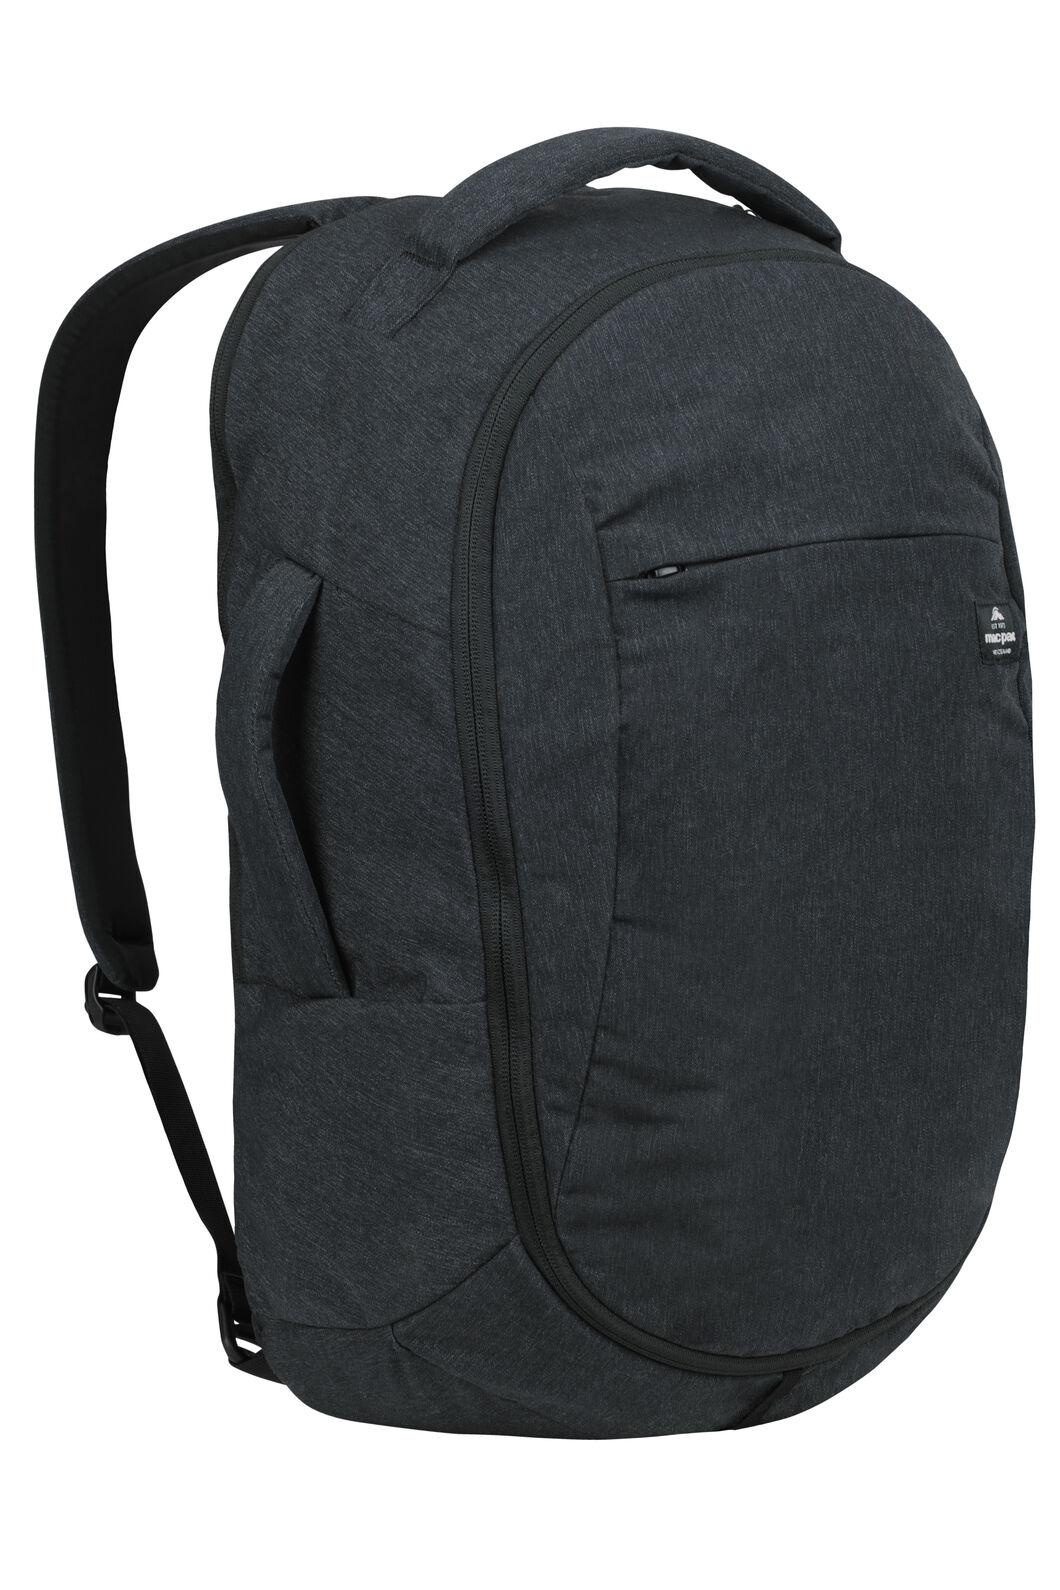 Macpac UTSIFOY 1.1 25L Backpack, Black, hi-res